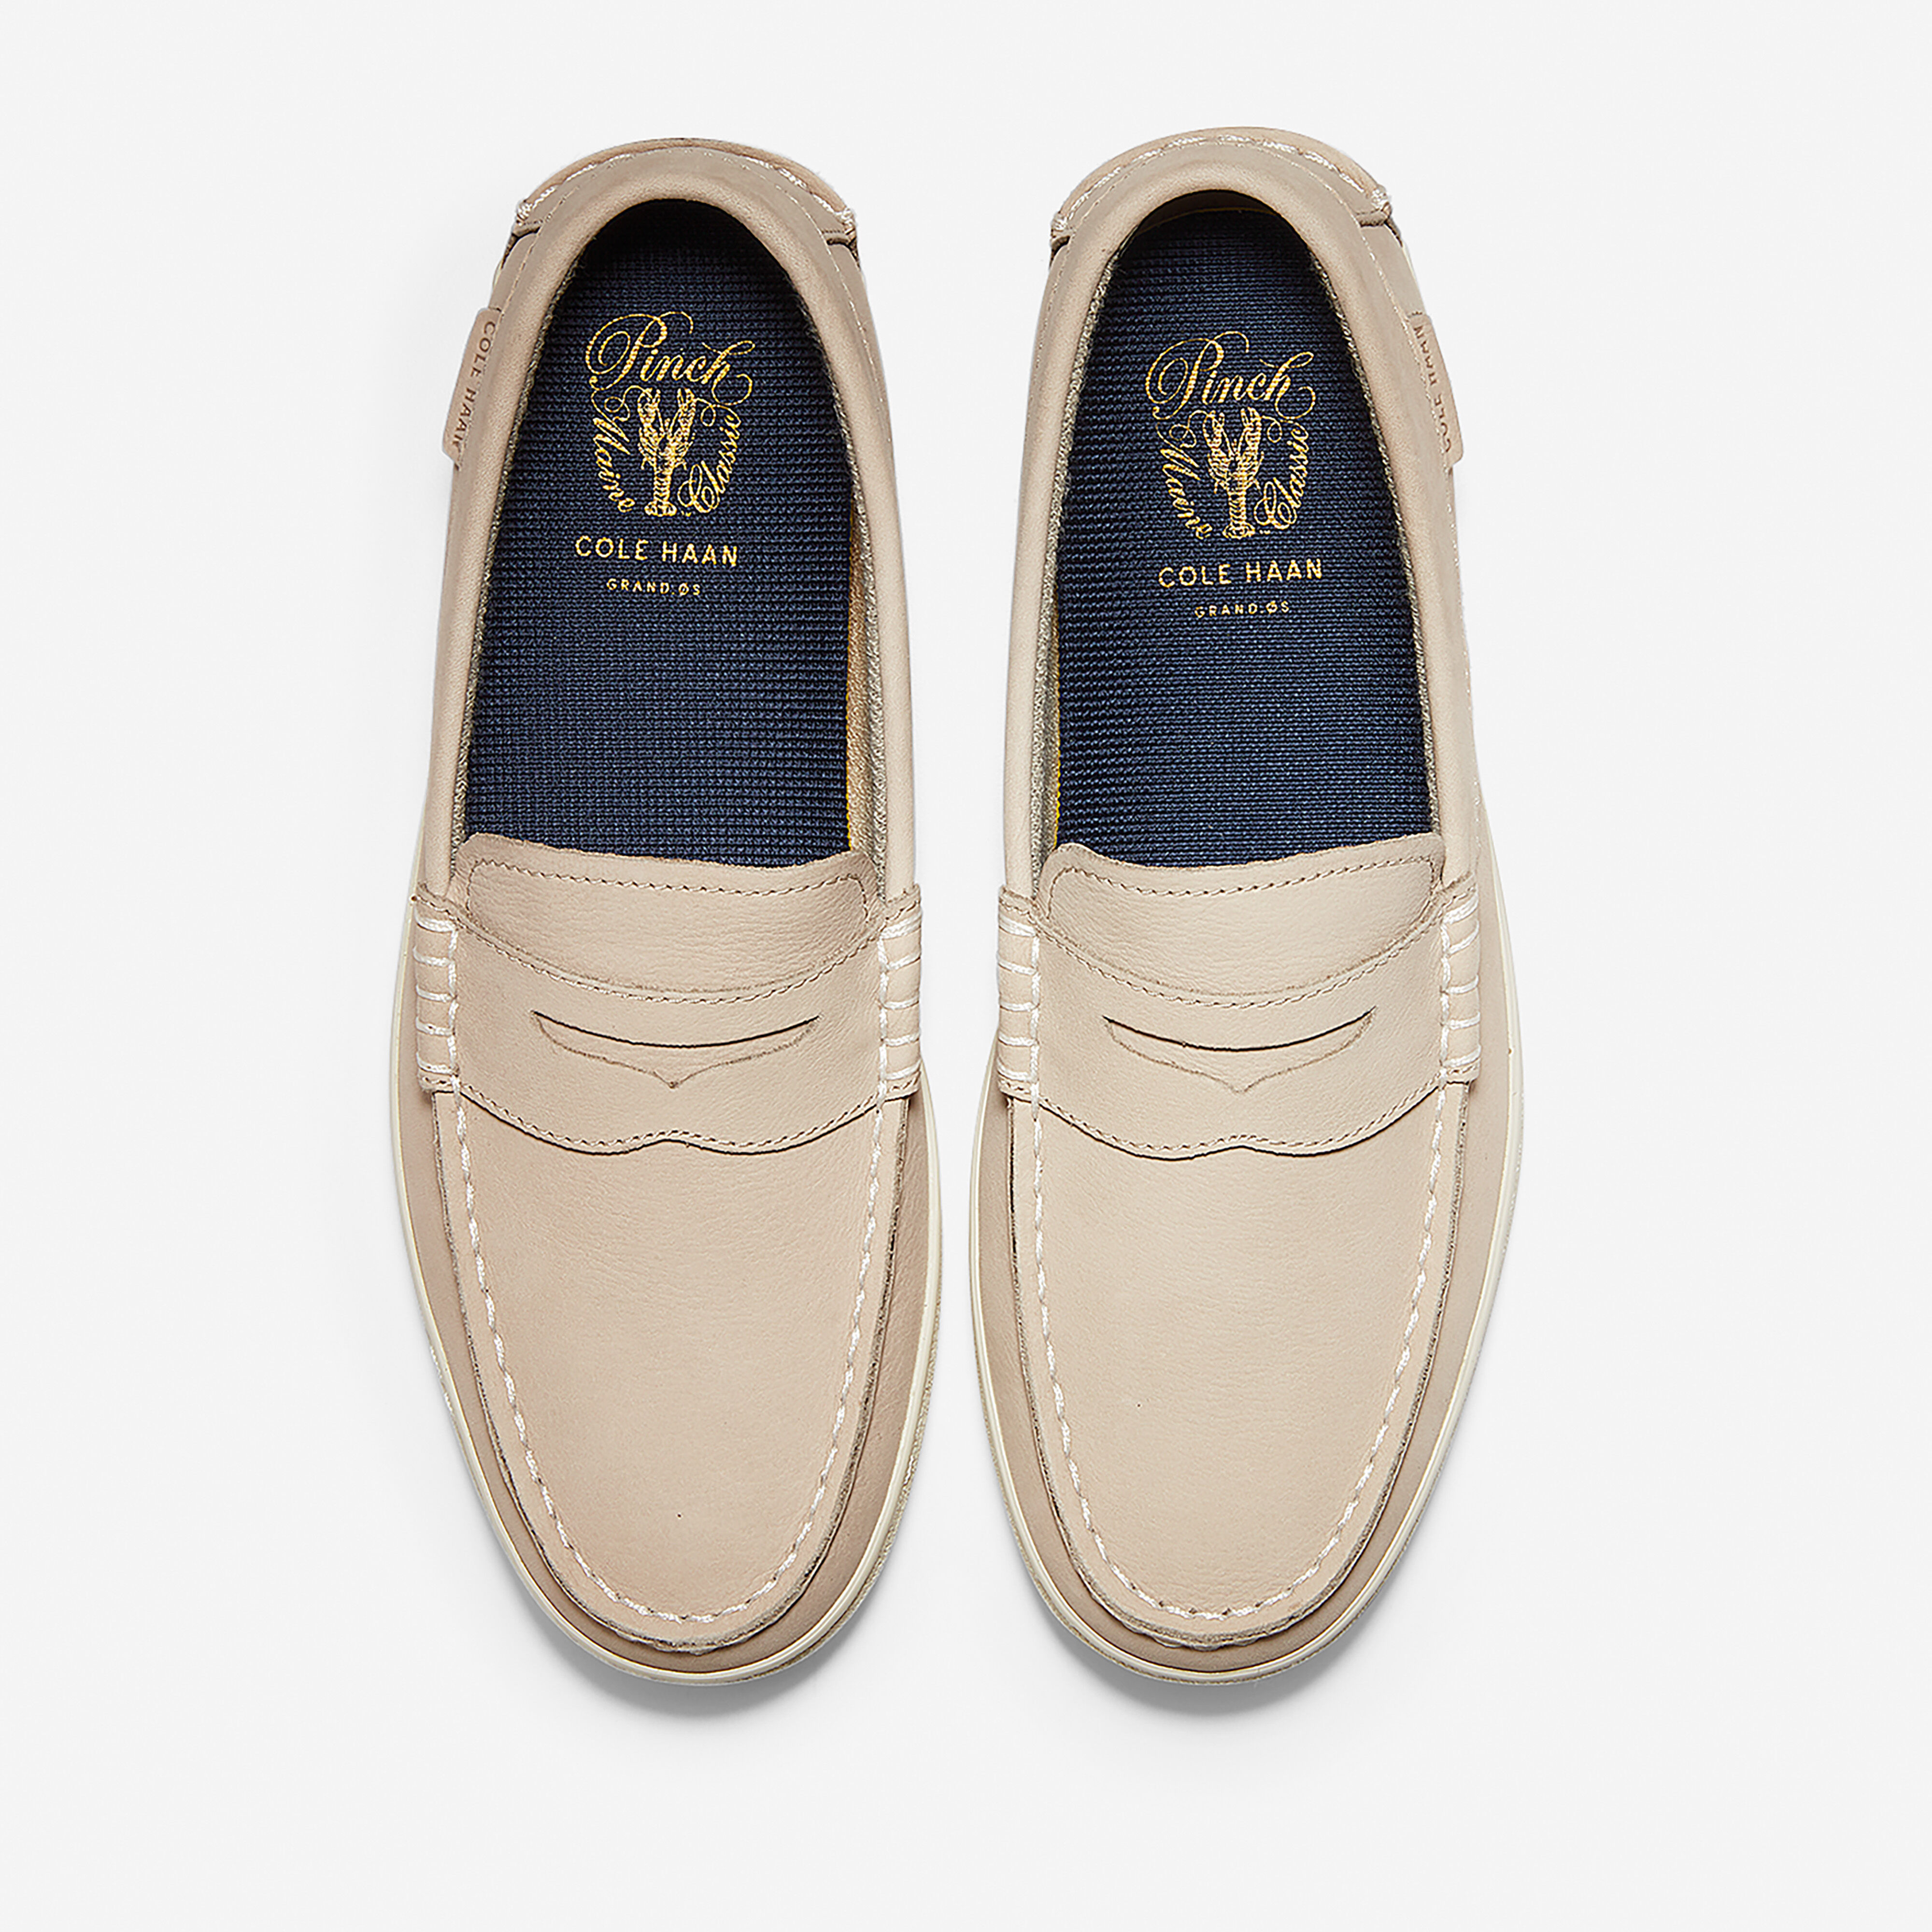 Men's Pinch Weekender Loafer in